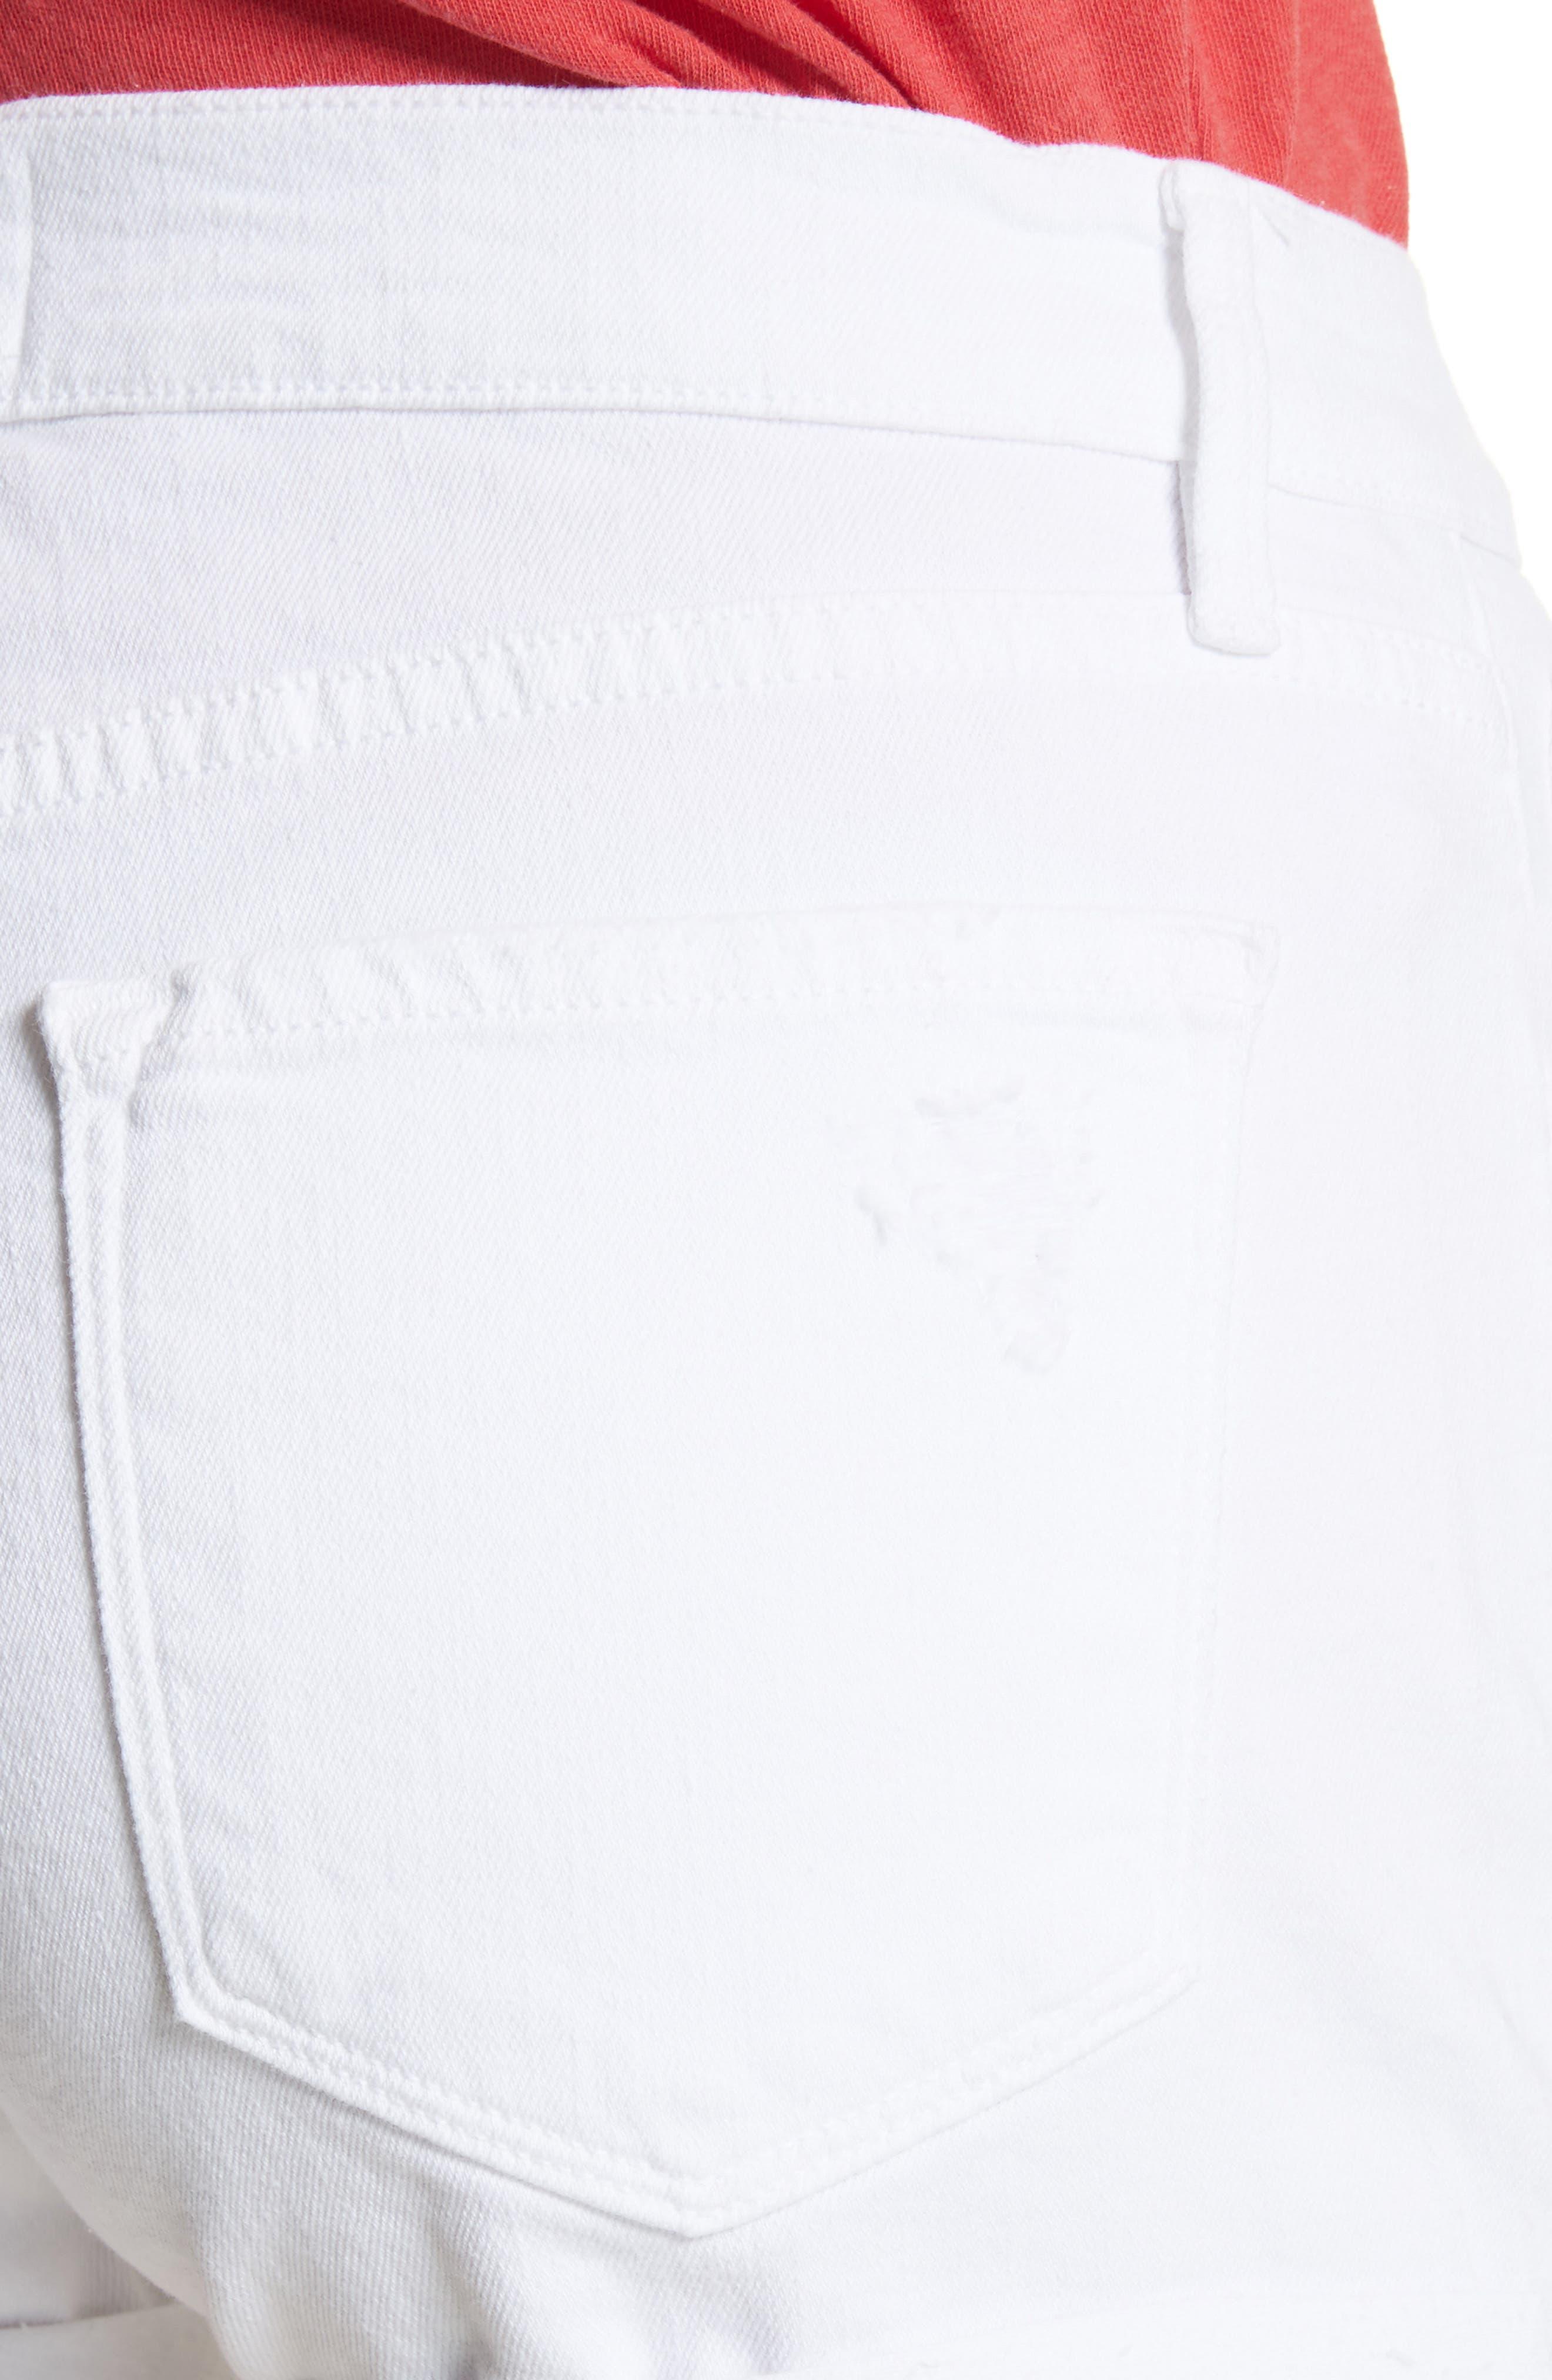 Le Cutoff Cuffed Jean Shorts,                             Alternate thumbnail 4, color,                             BLANC ROOKLEY